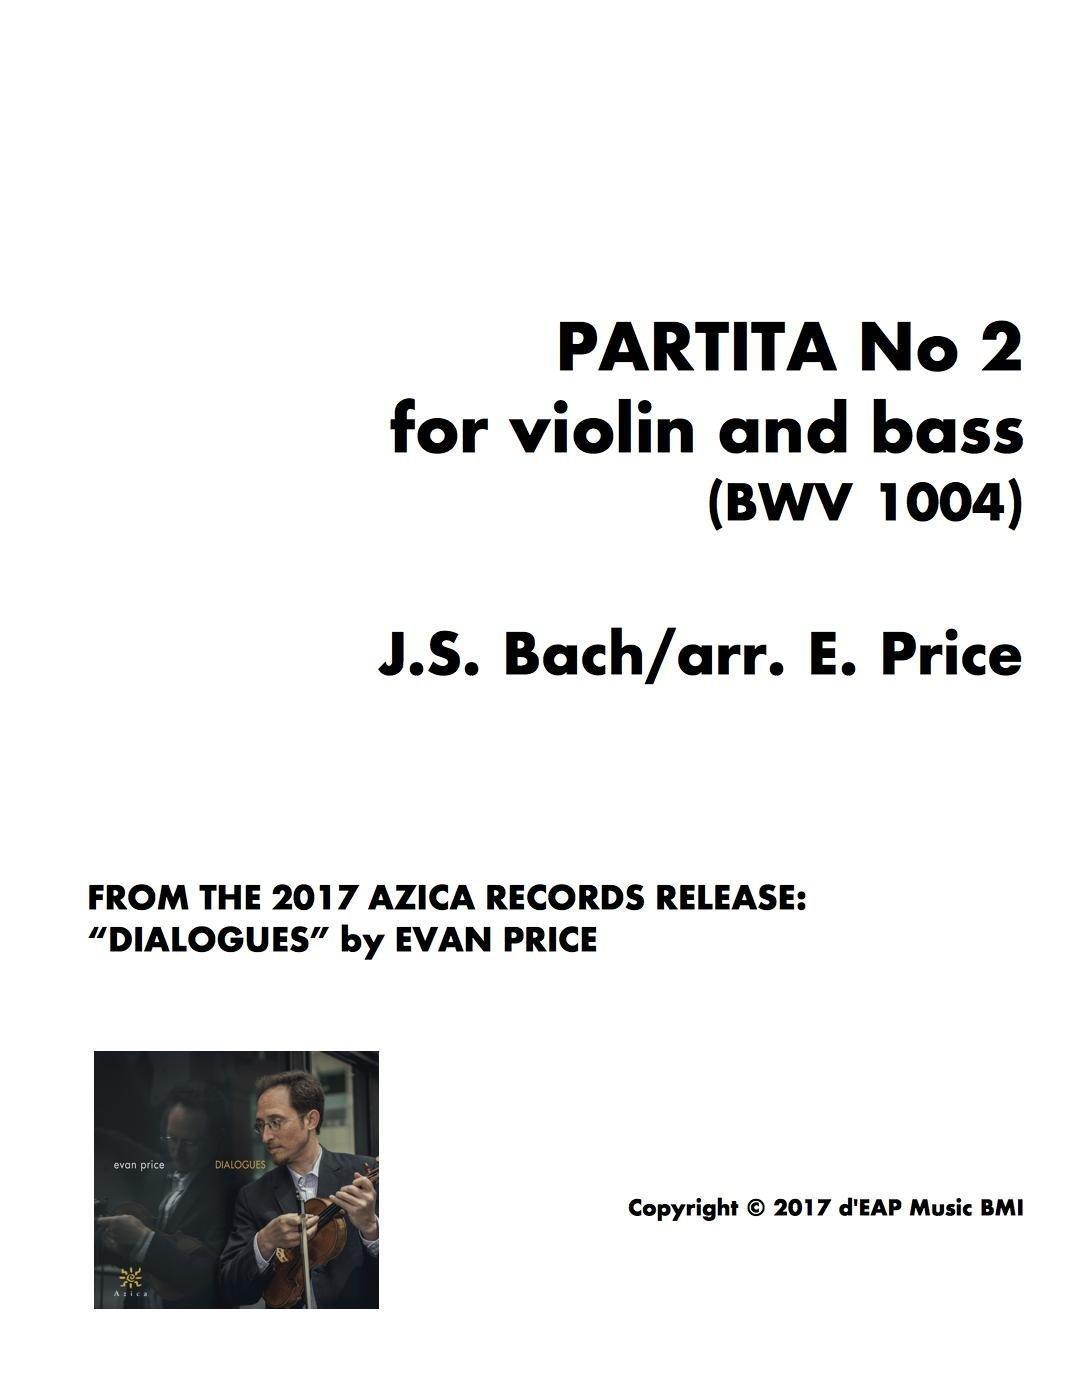 Partita No 2 for violin and bass/cello (BWV 1004) (pdf)